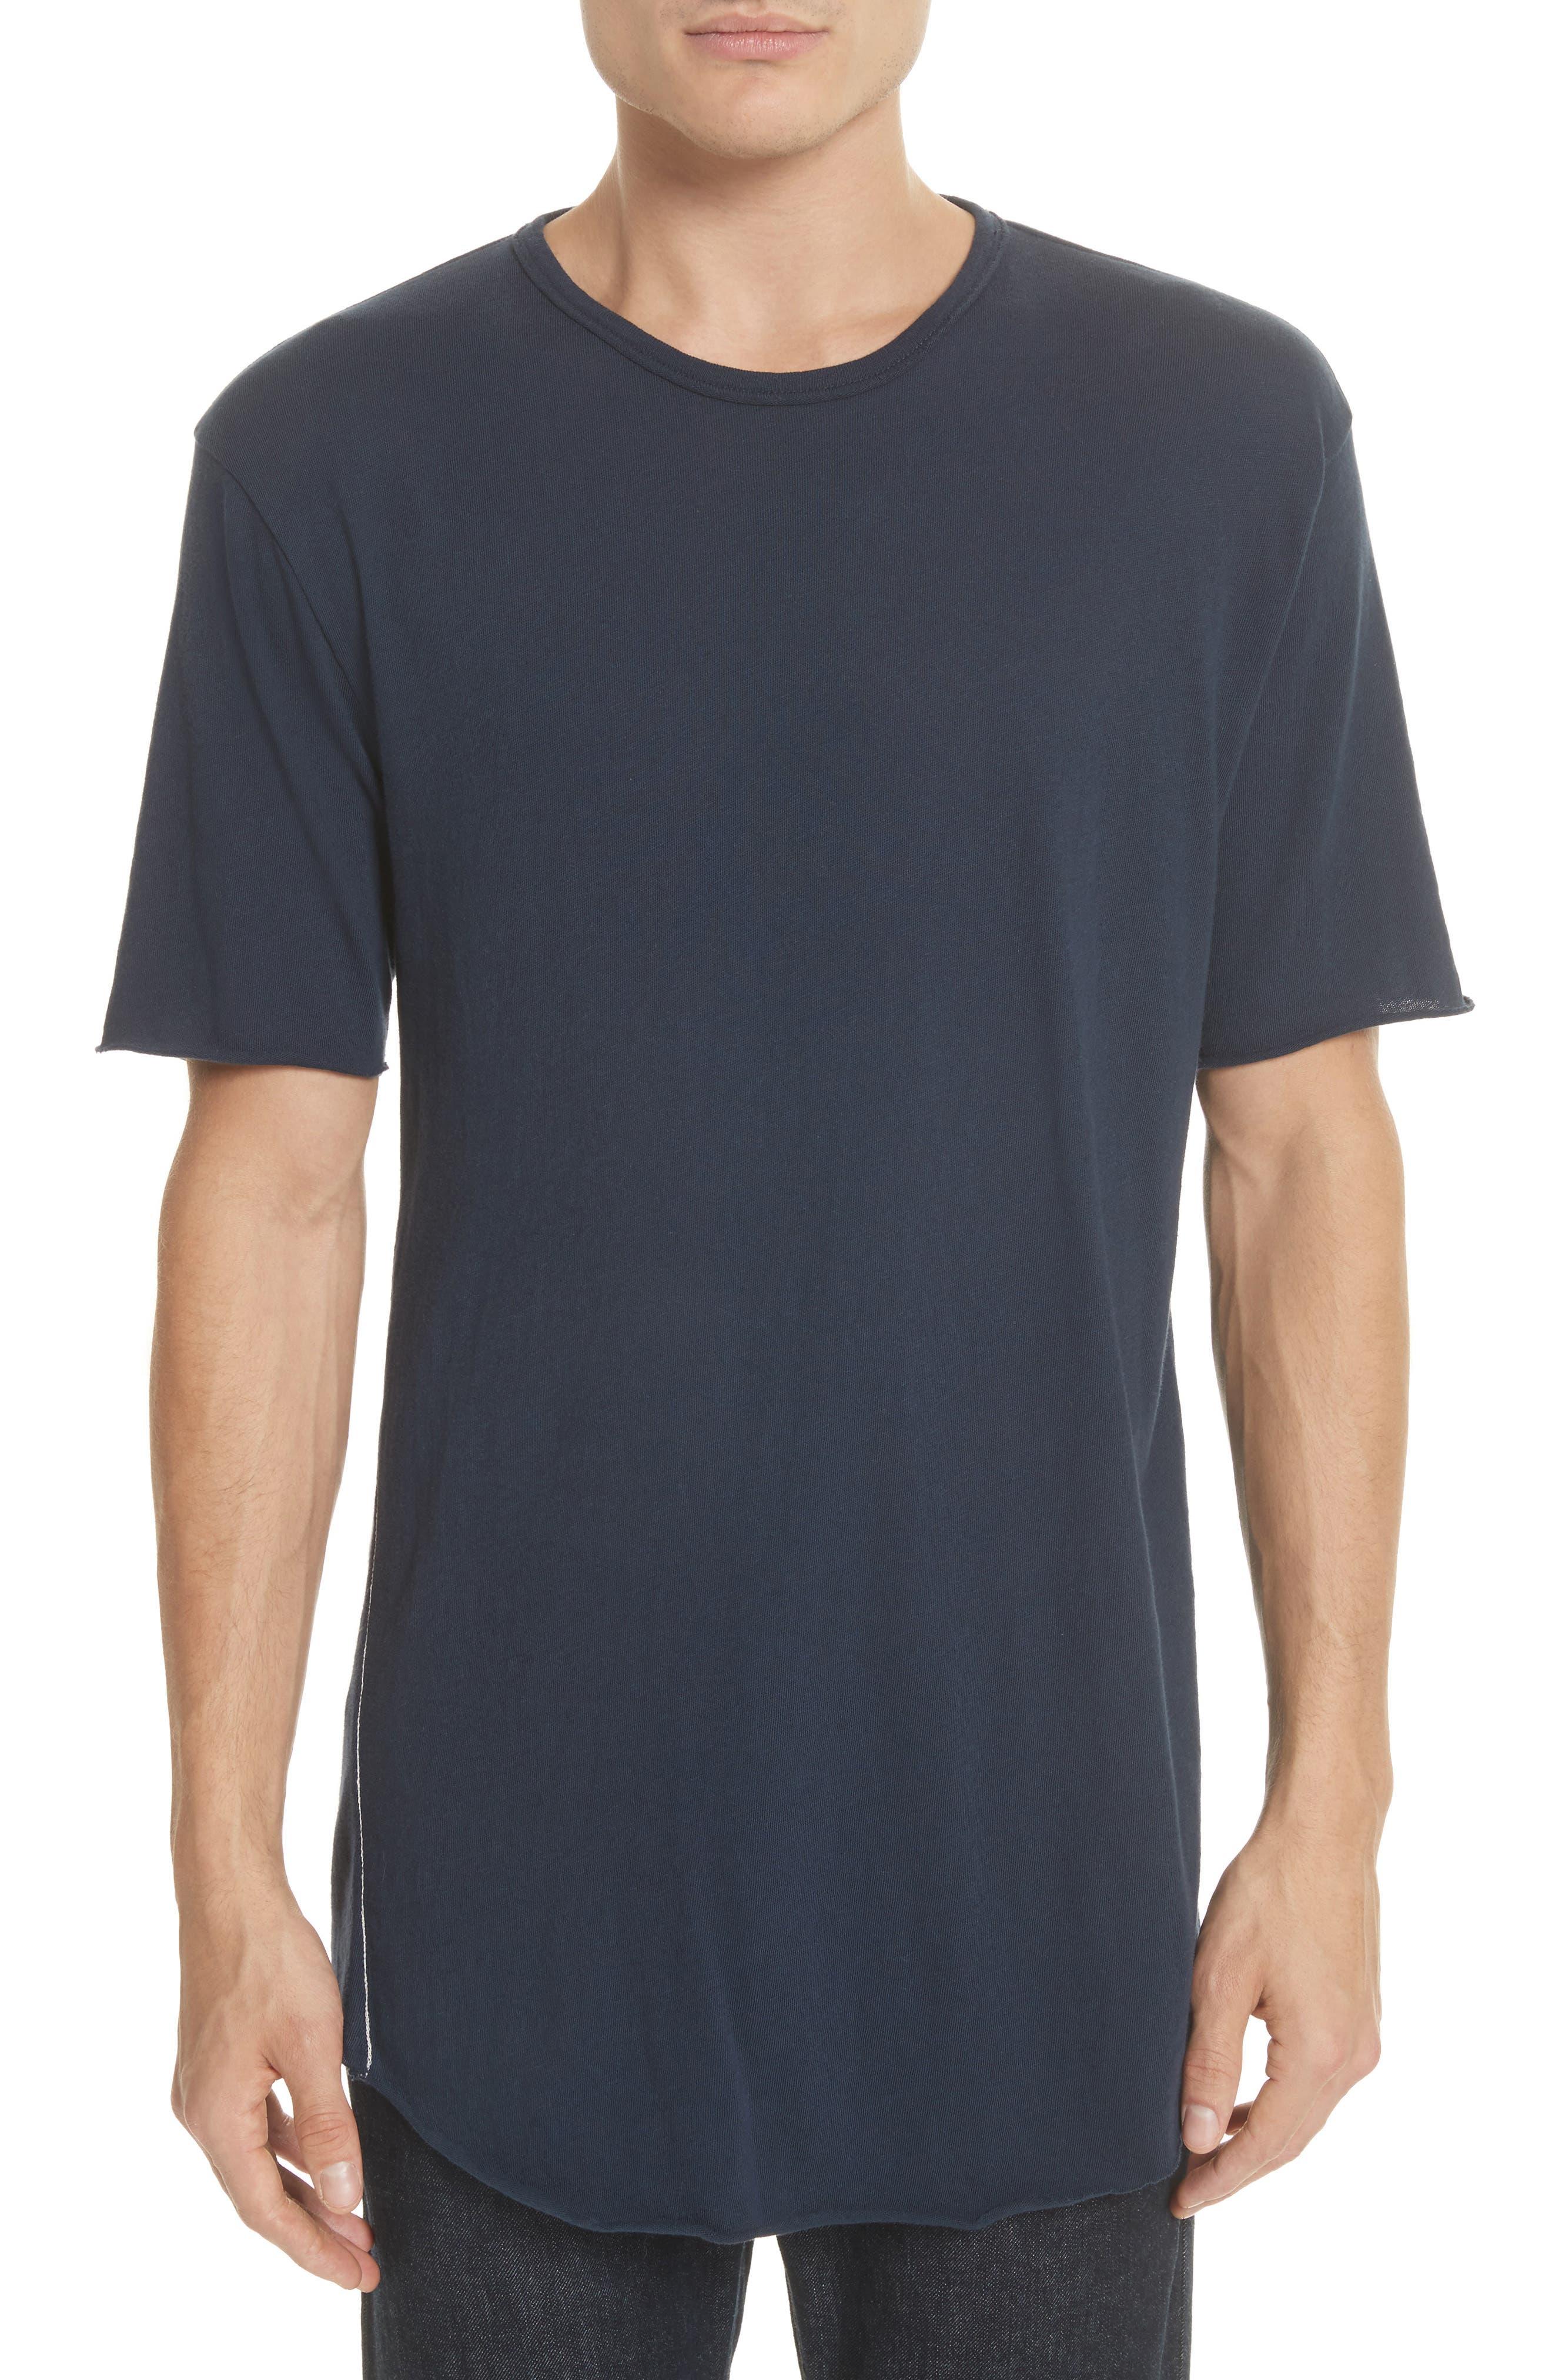 RAG & BONE Hartley Crewneck Cotton & Linen T-Shirt, Main, color, 410